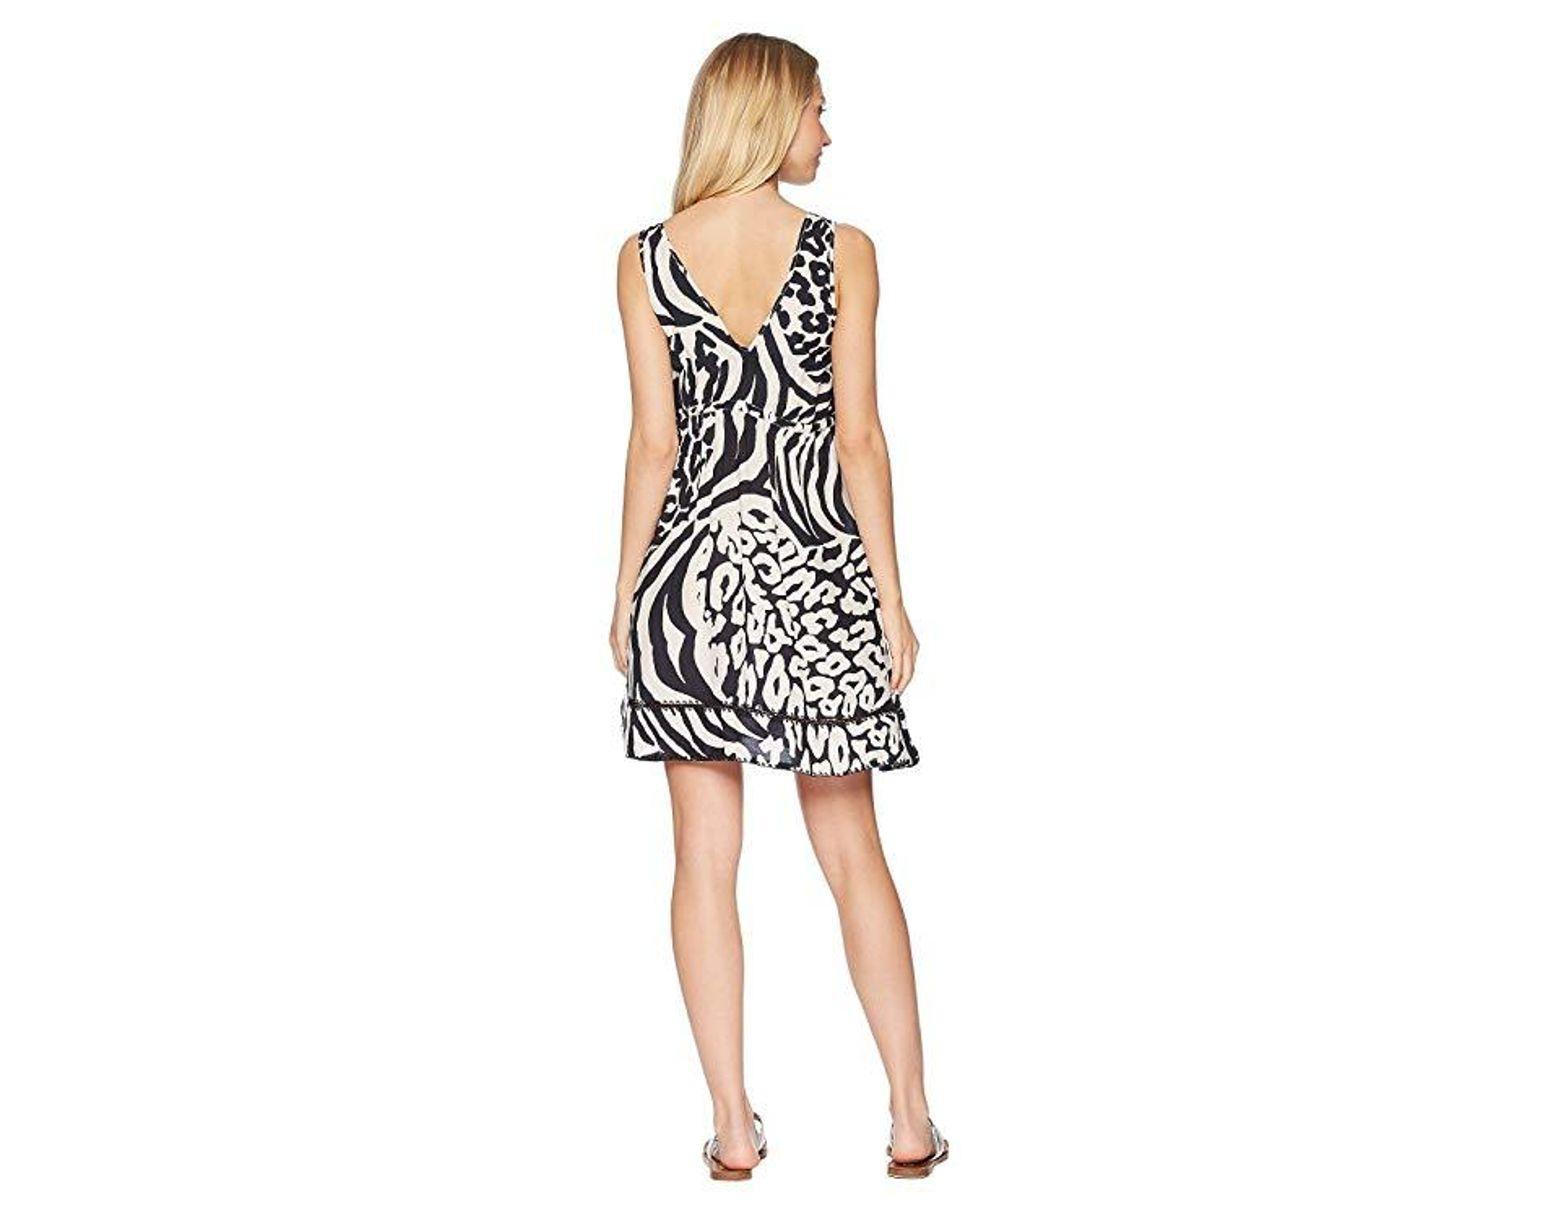 f90ef2f78 Luli Fama Cayo Setia Stitched V-neck Short Dress Cover-up (multi) Swimwear  in Black - Save 33% - Lyst